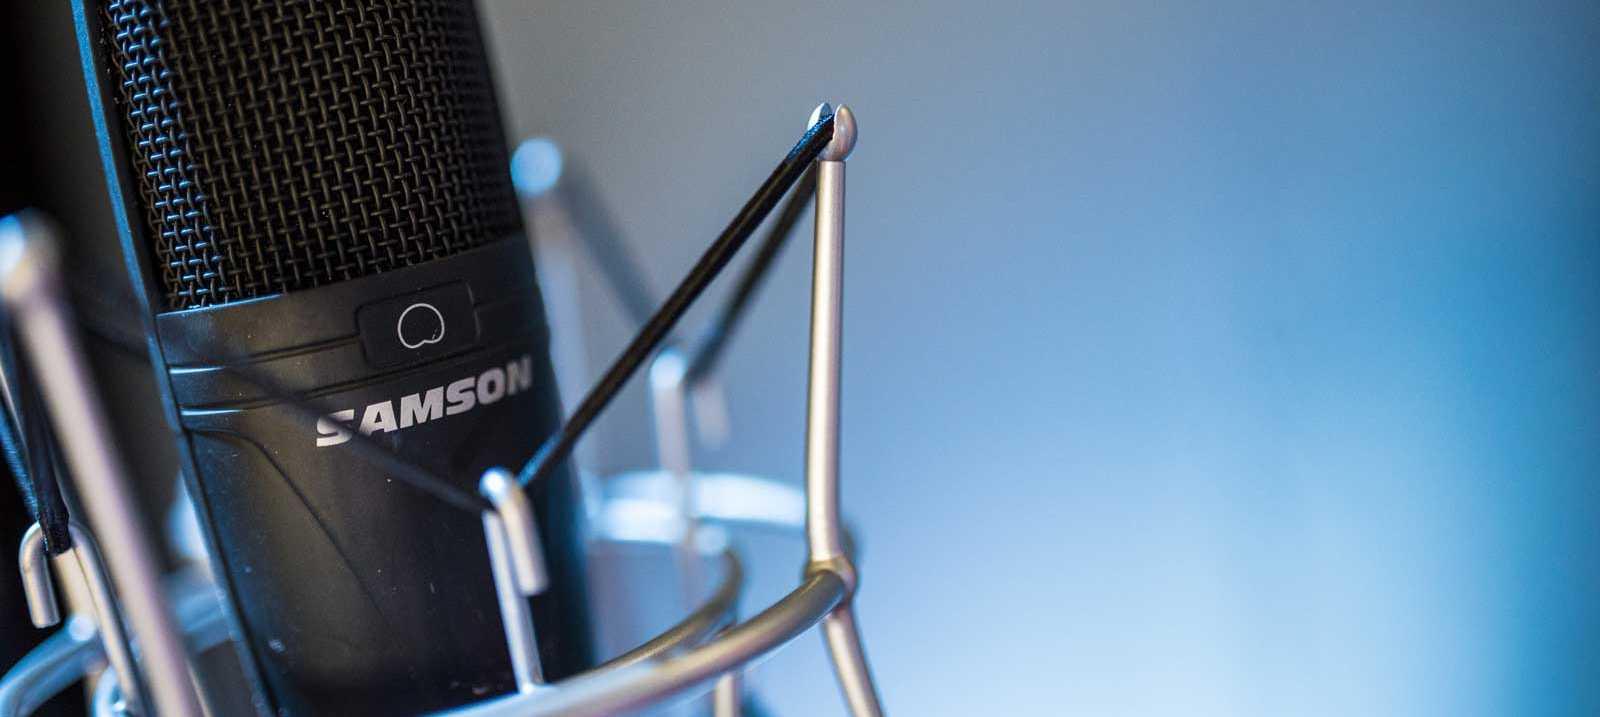 Podcast Mikrofon